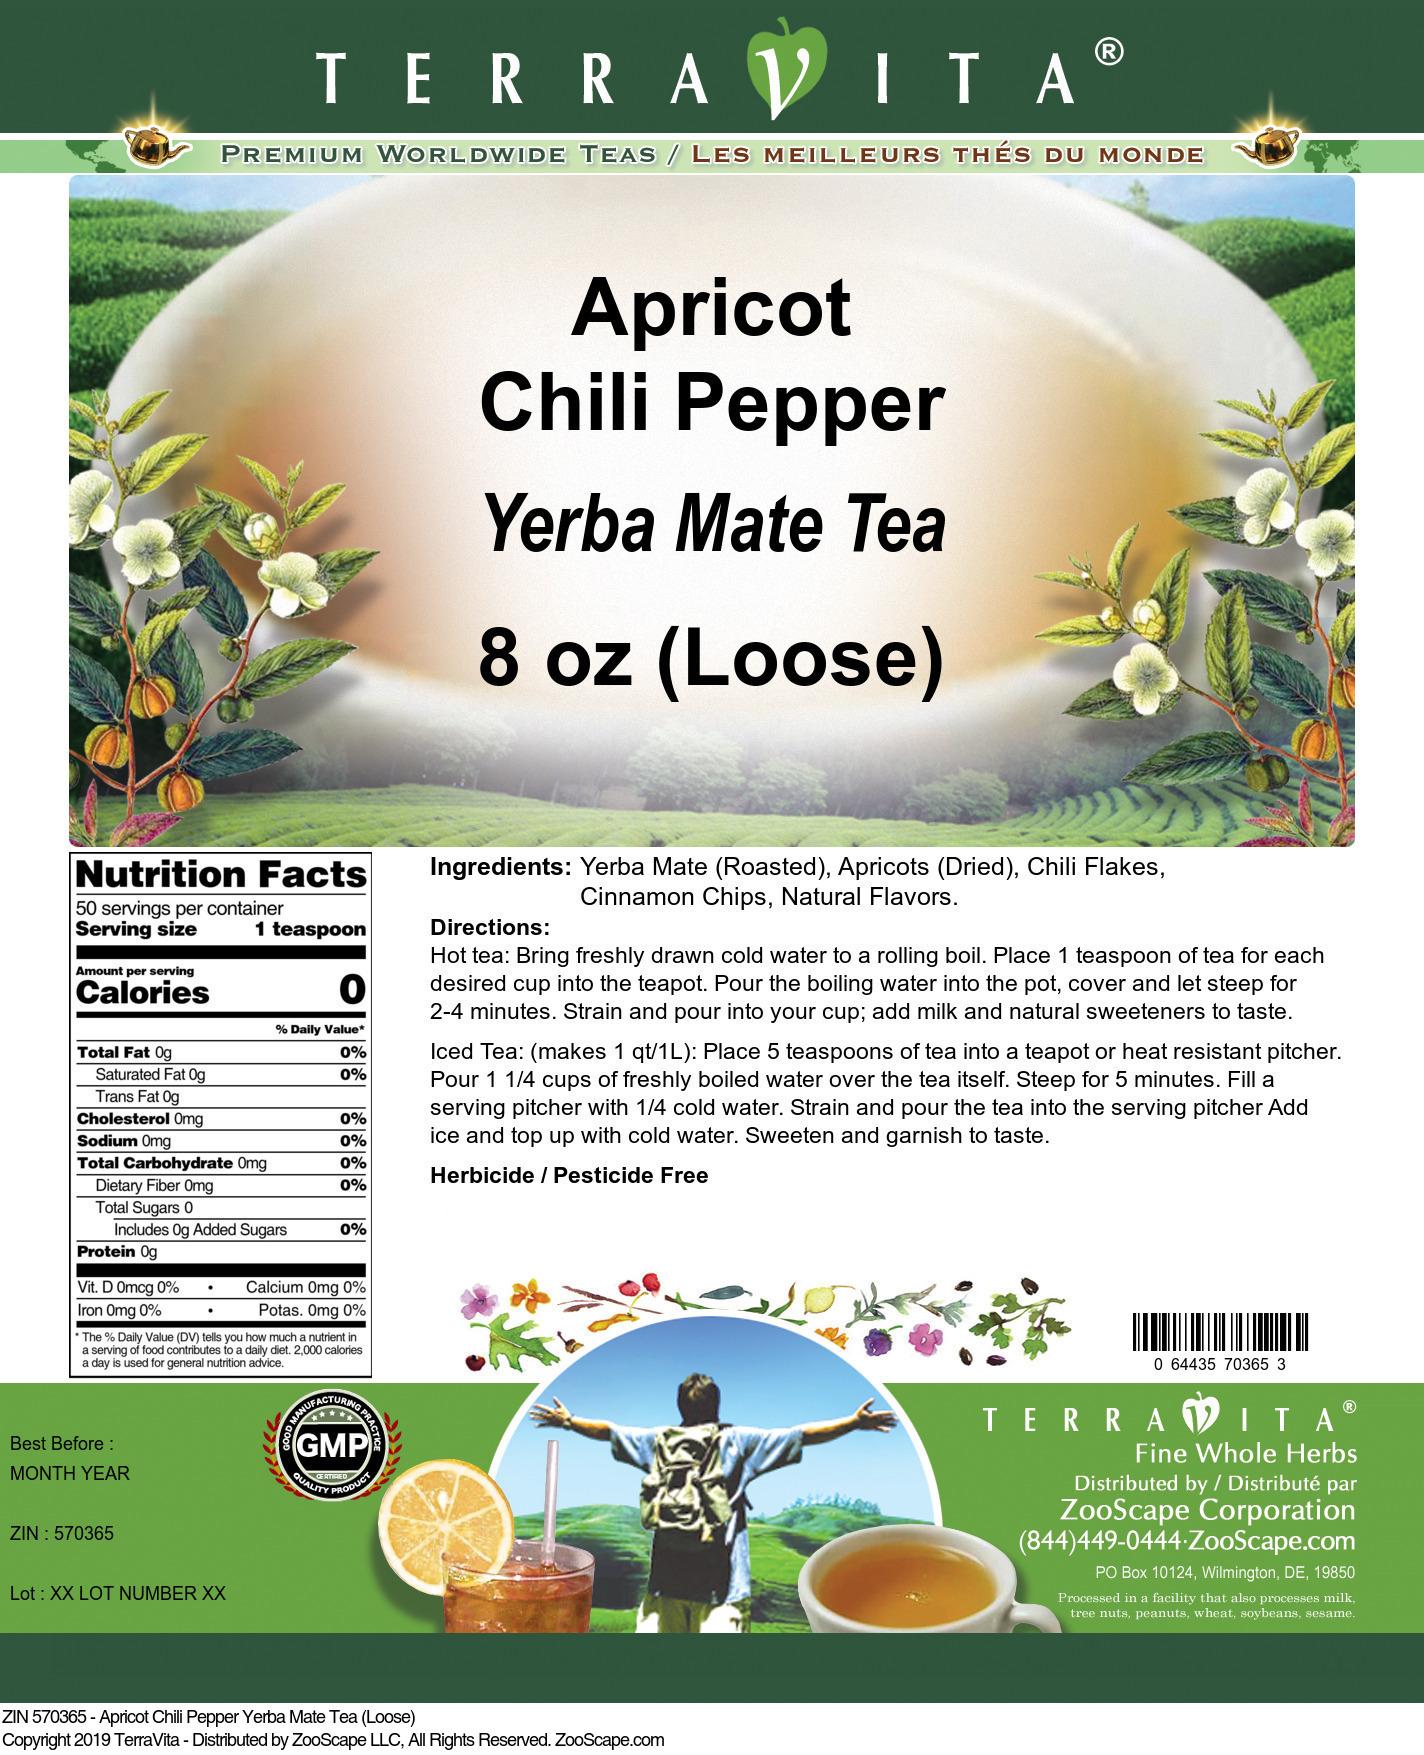 Apricot Chili Pepper Yerba Mate Tea (Loose)